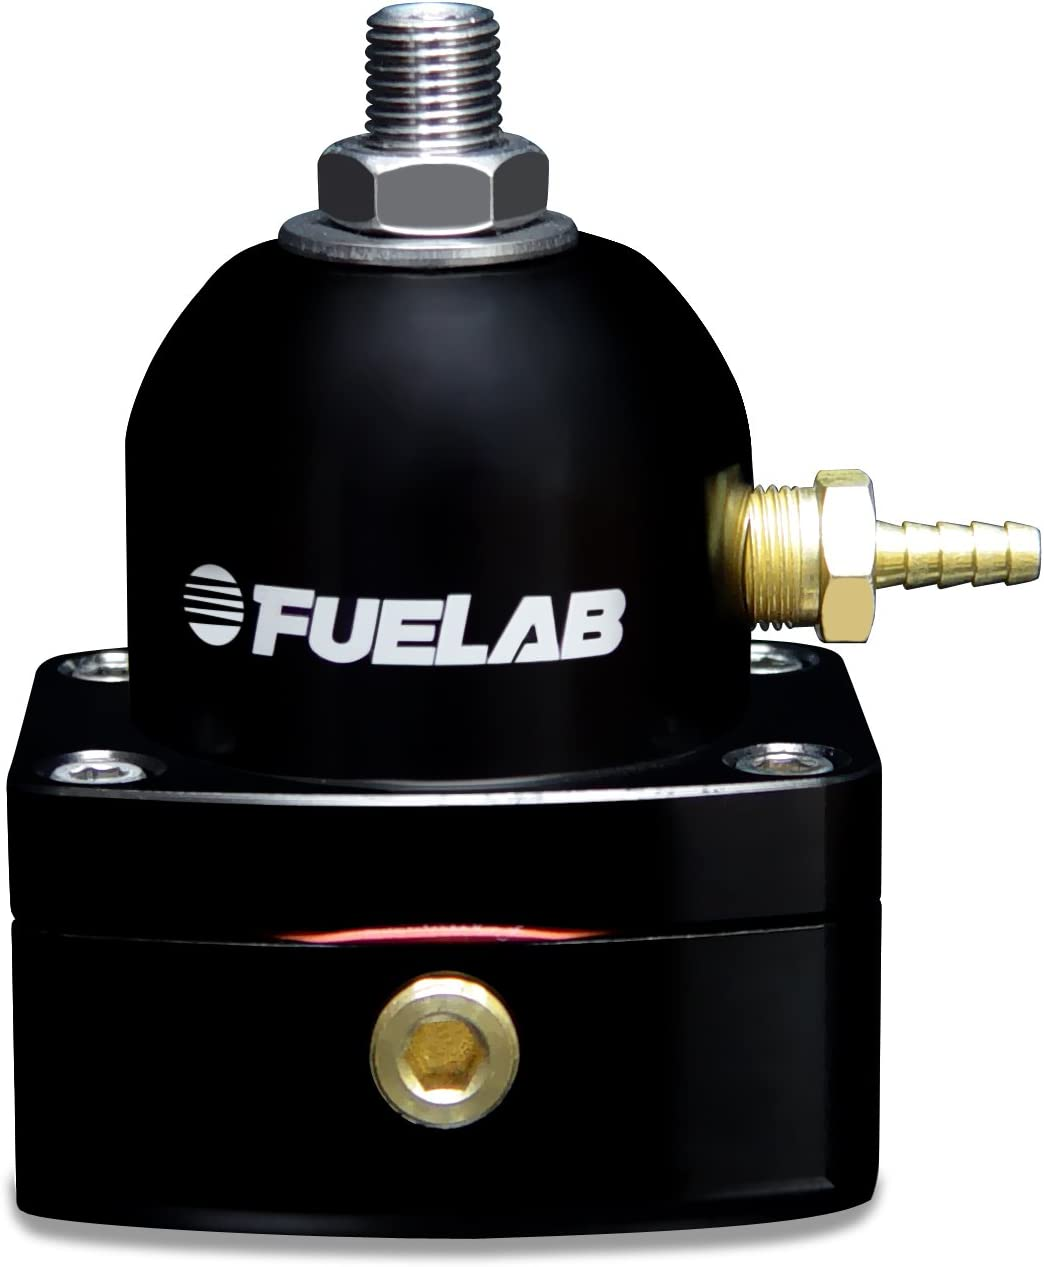 Fuelab 52501-1 Universal Black In-Line Adjustable Fuel EFI Bargain New color Press